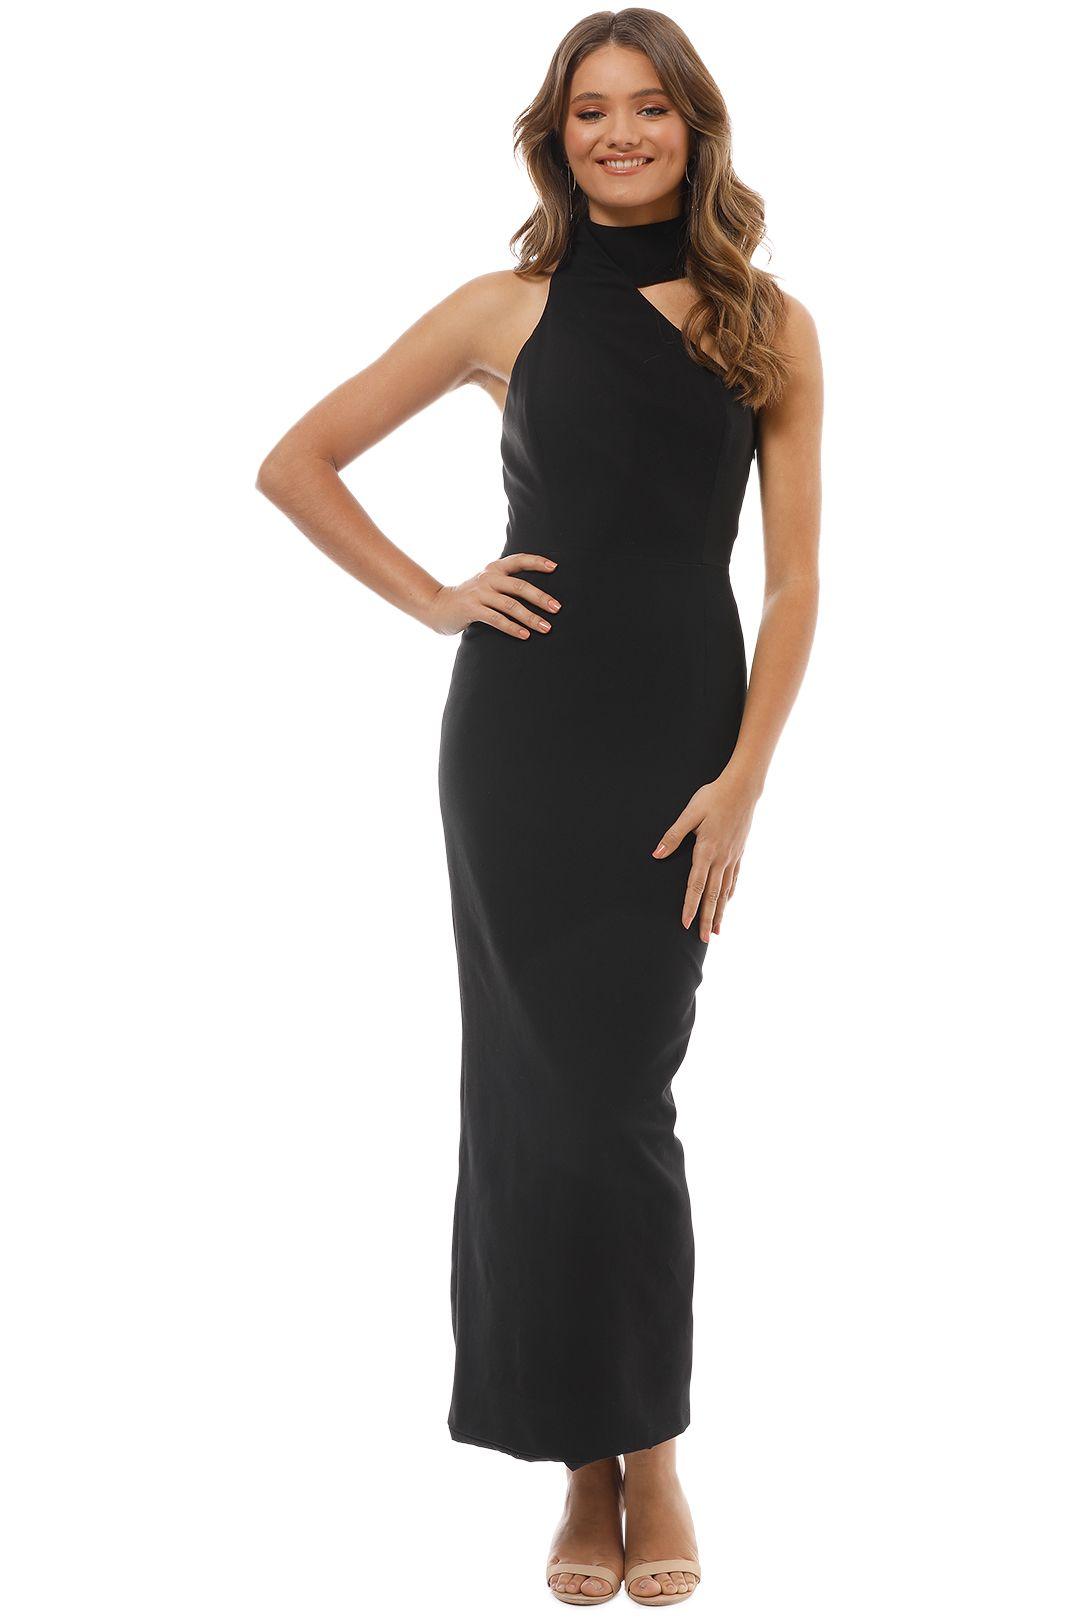 Elle Zeitoune - Harper Dress - Black - Front